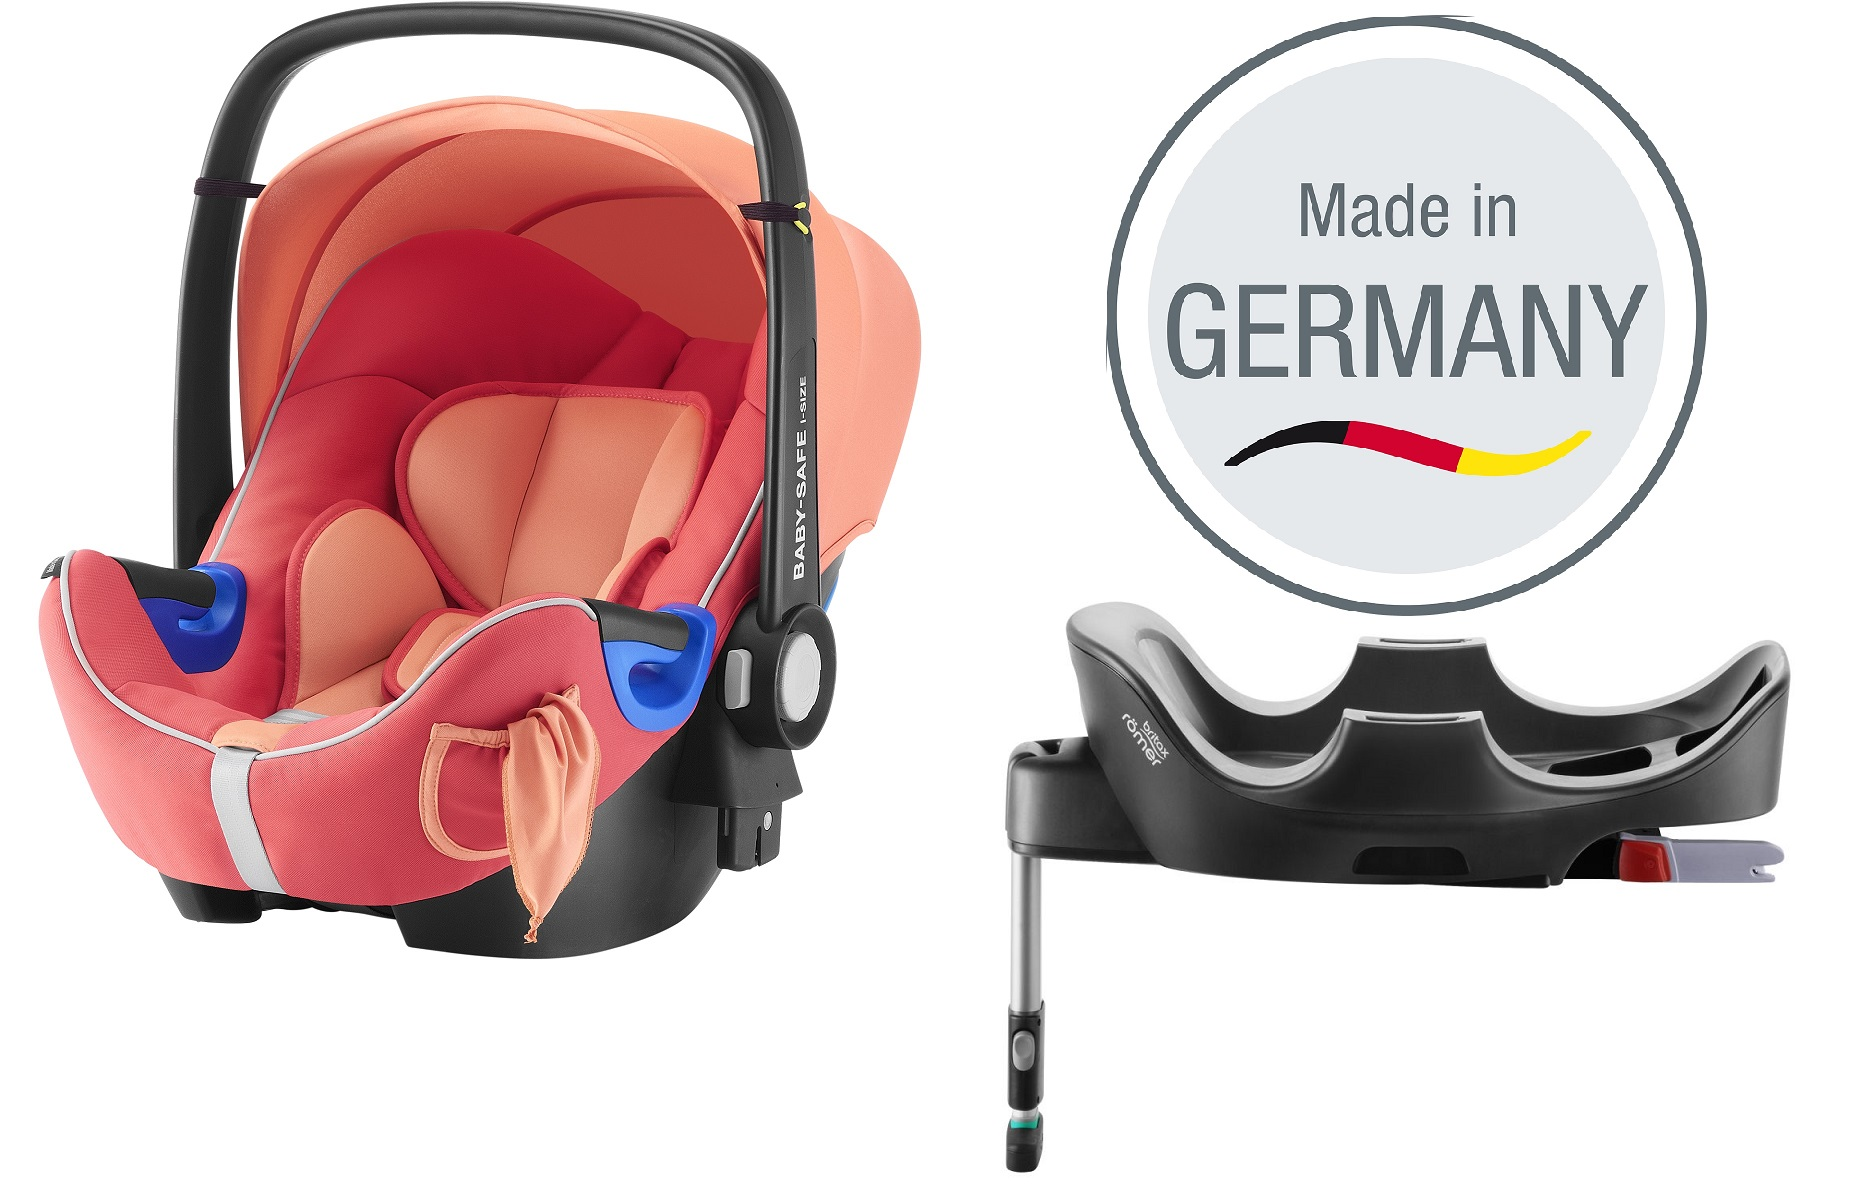 Britax Rmer Infant Car Seat Baby Safe I Size Including Flex Base Coral Peach 2018